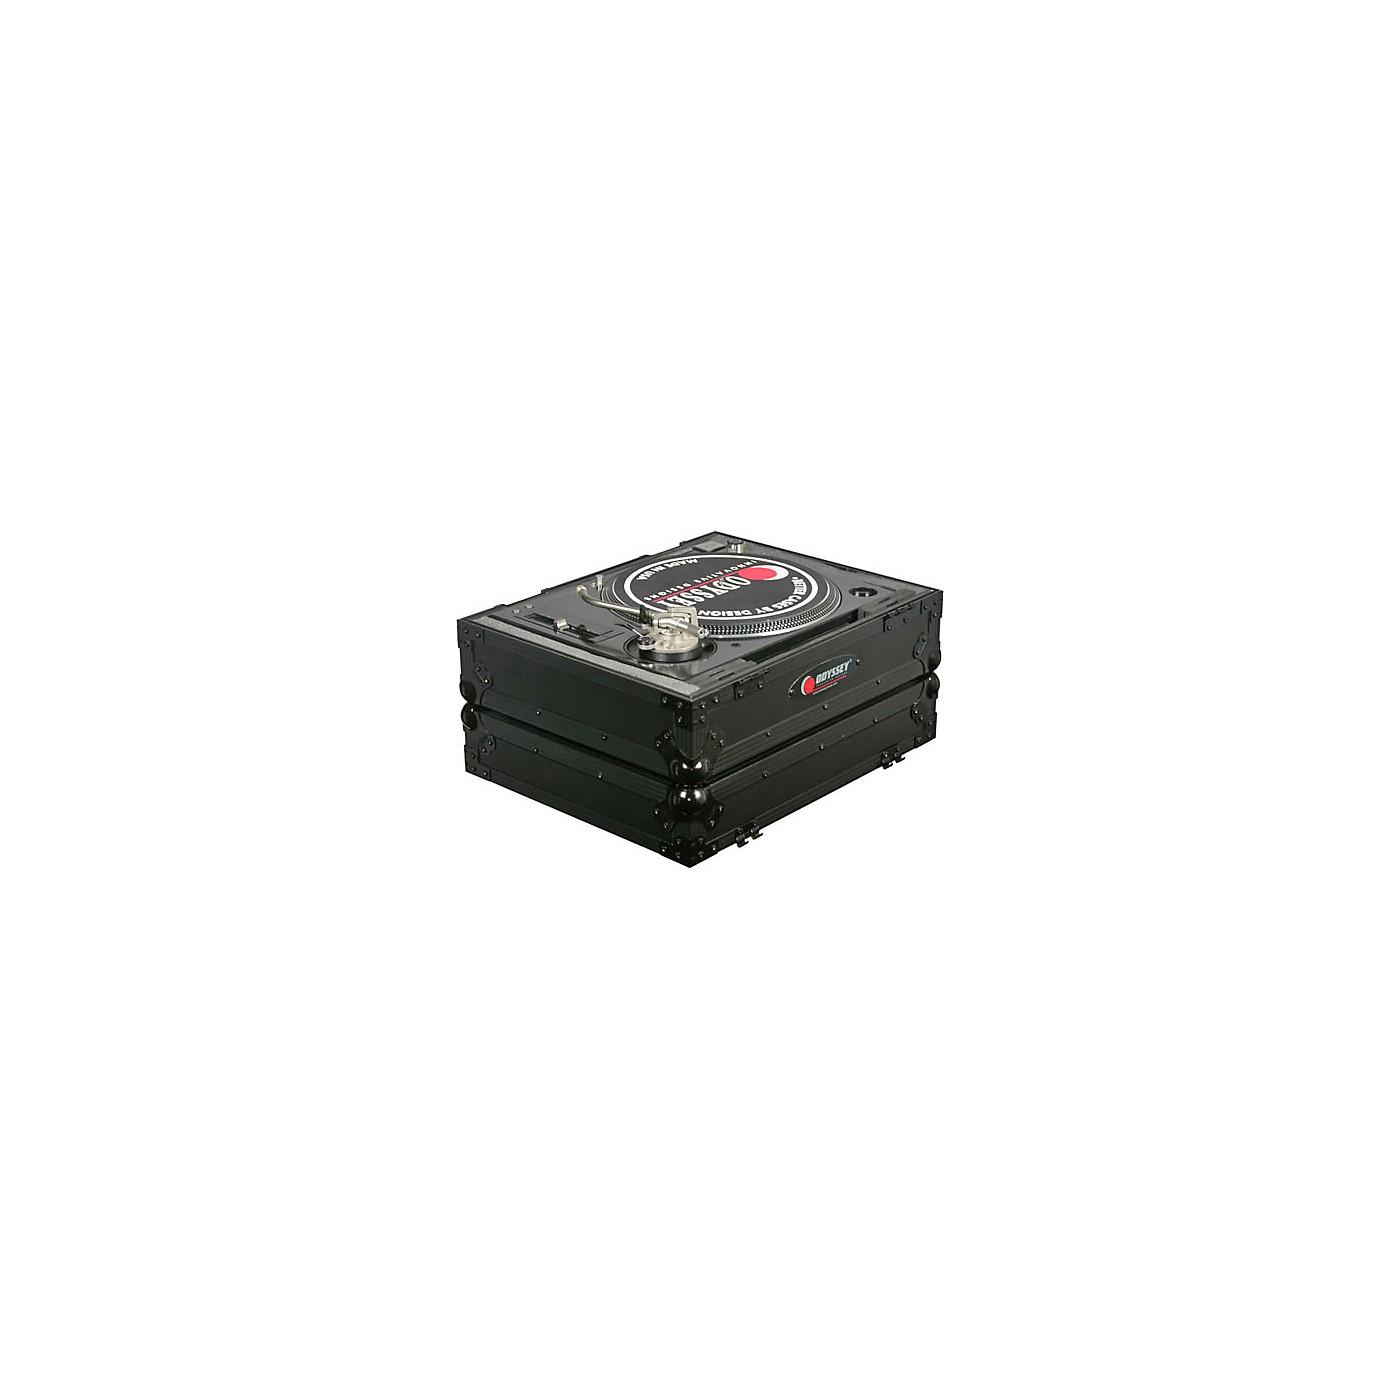 Odyssey Black Label FZ1200BL Universal Flight Case for 1200-Style DJ Turntable thumbnail